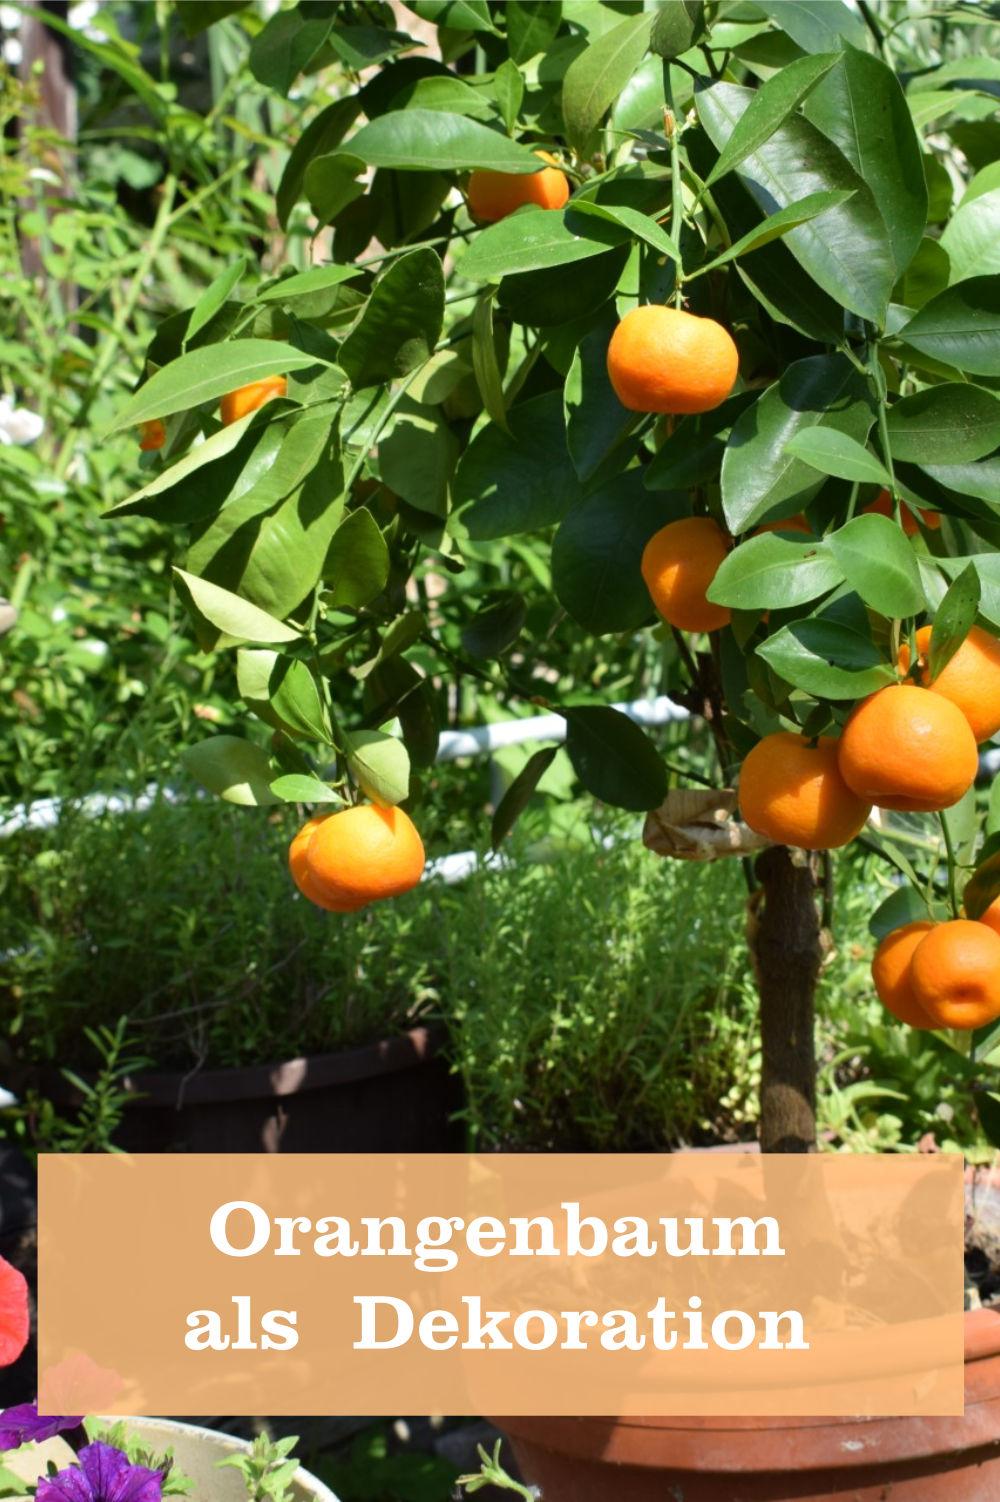 Orangenbaum als Dekoration